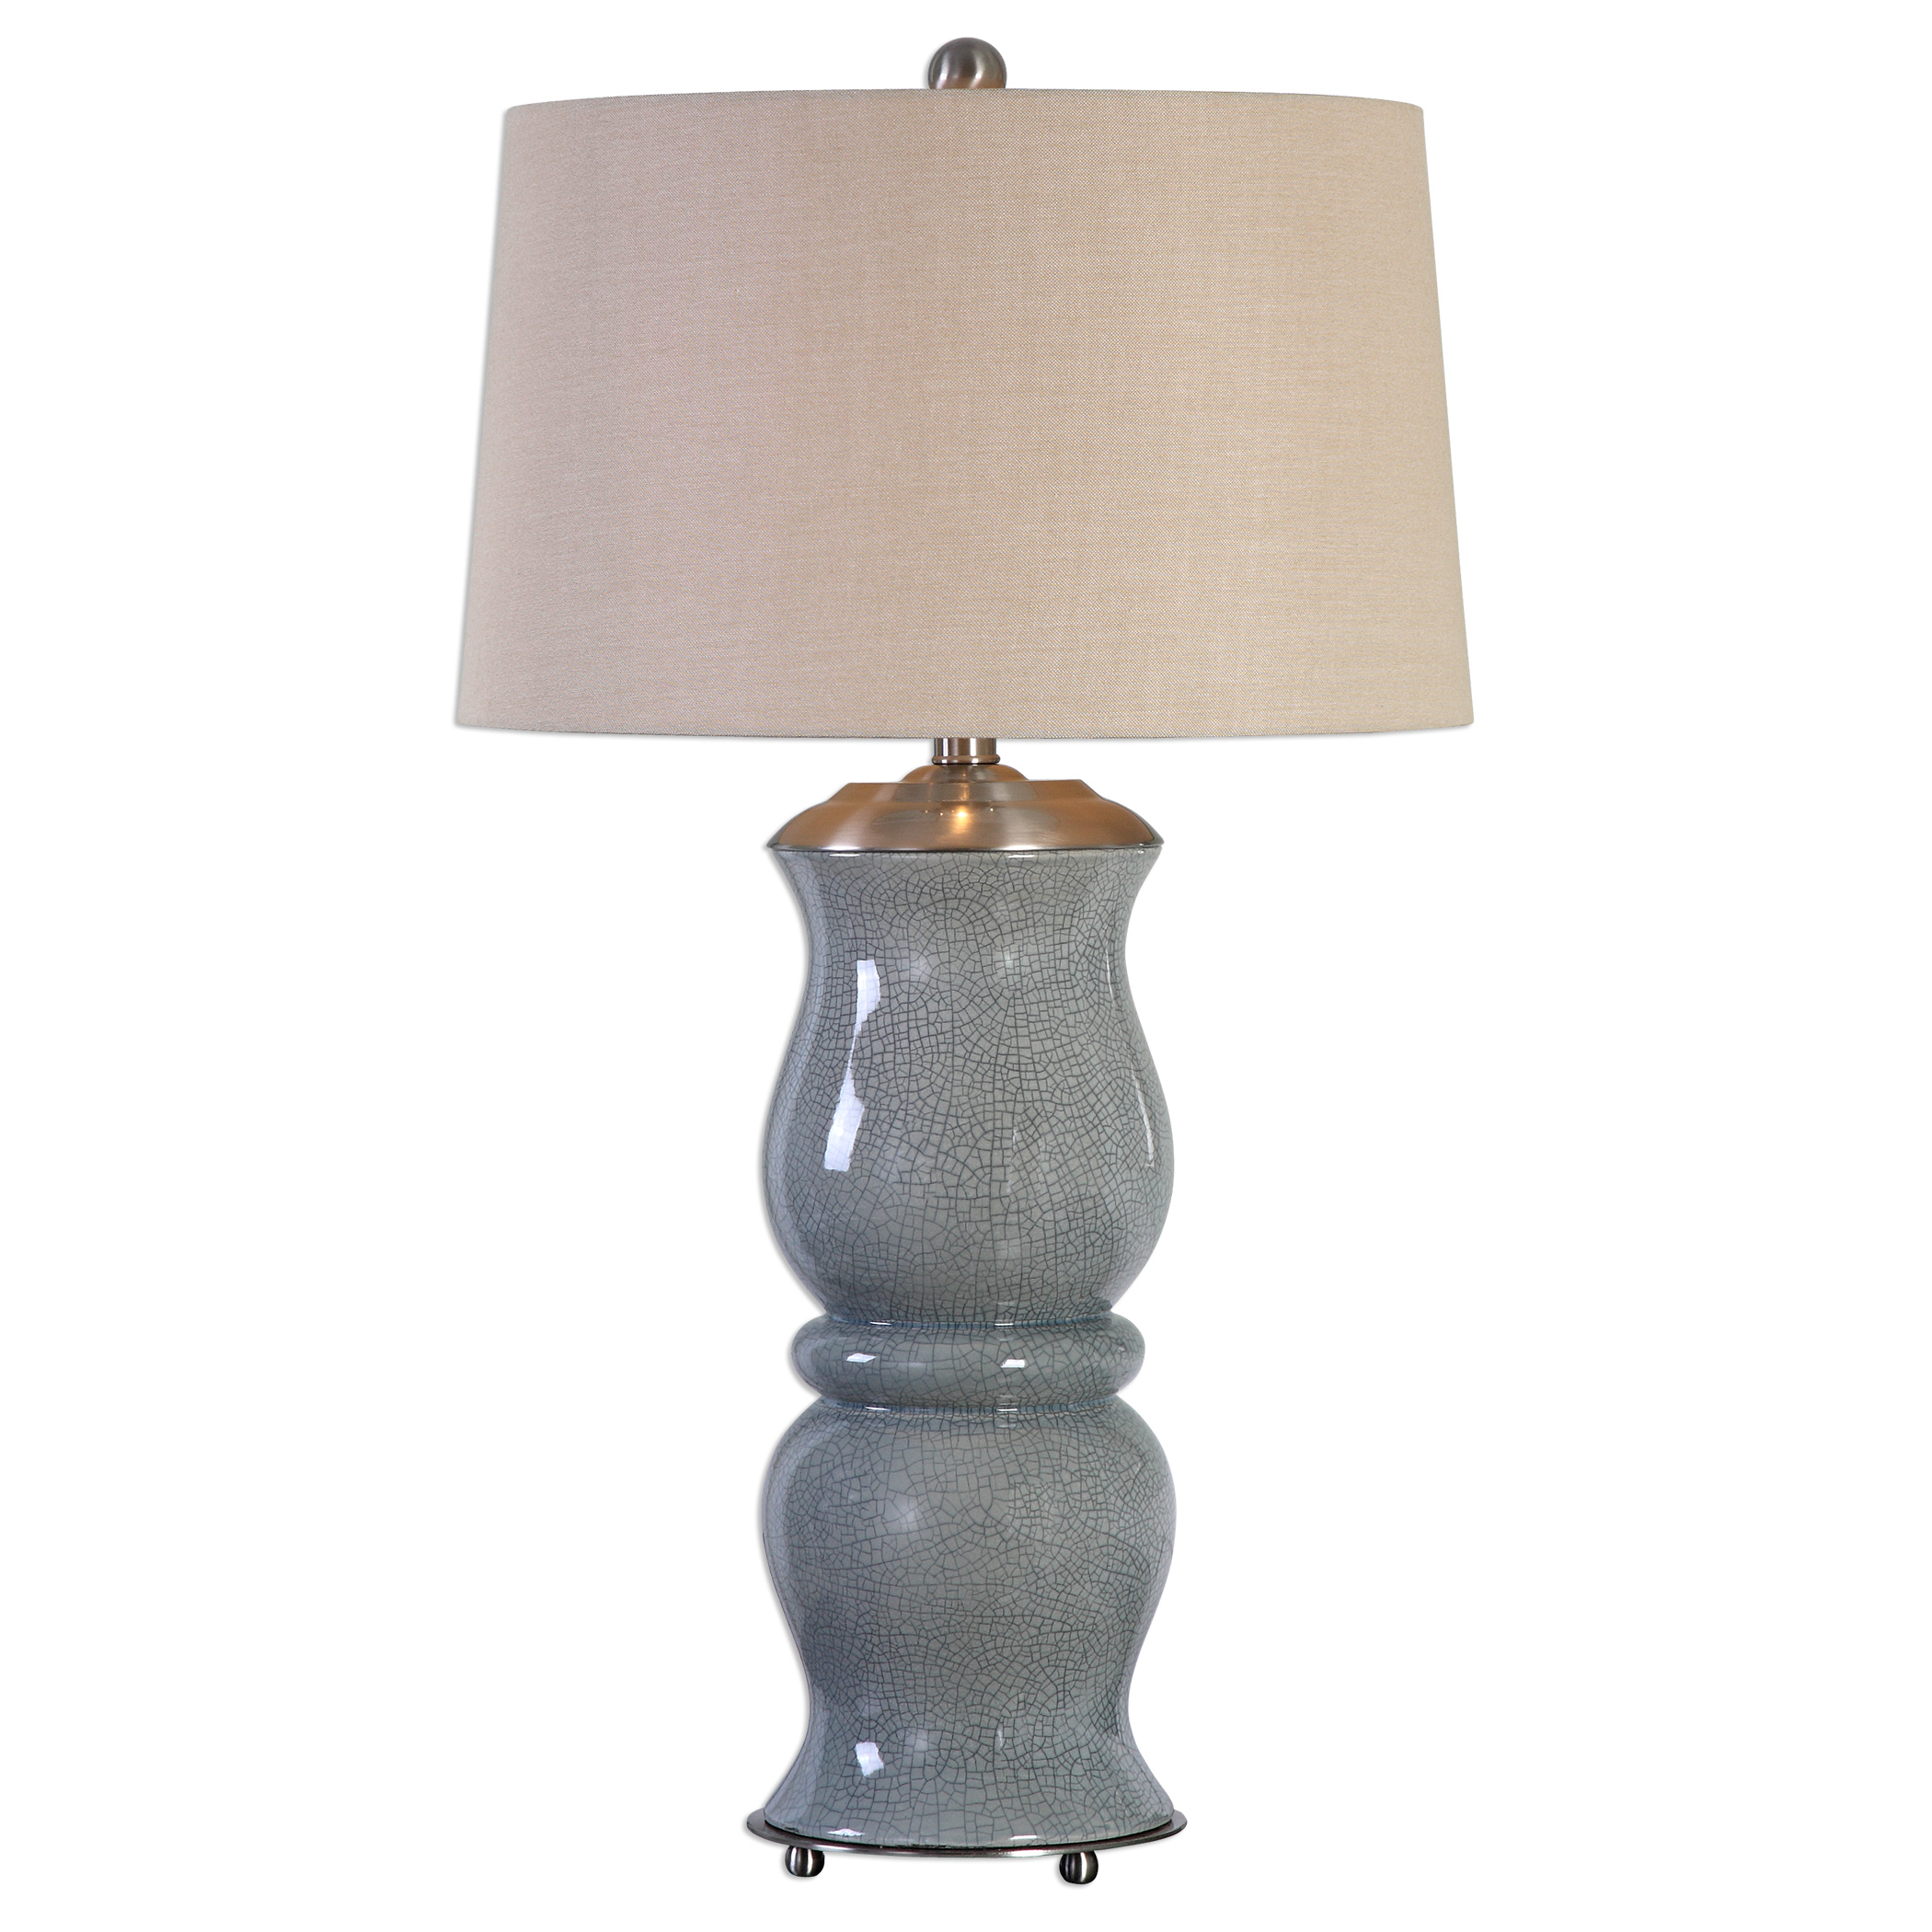 Cannobino Pale Blue Table Lamp